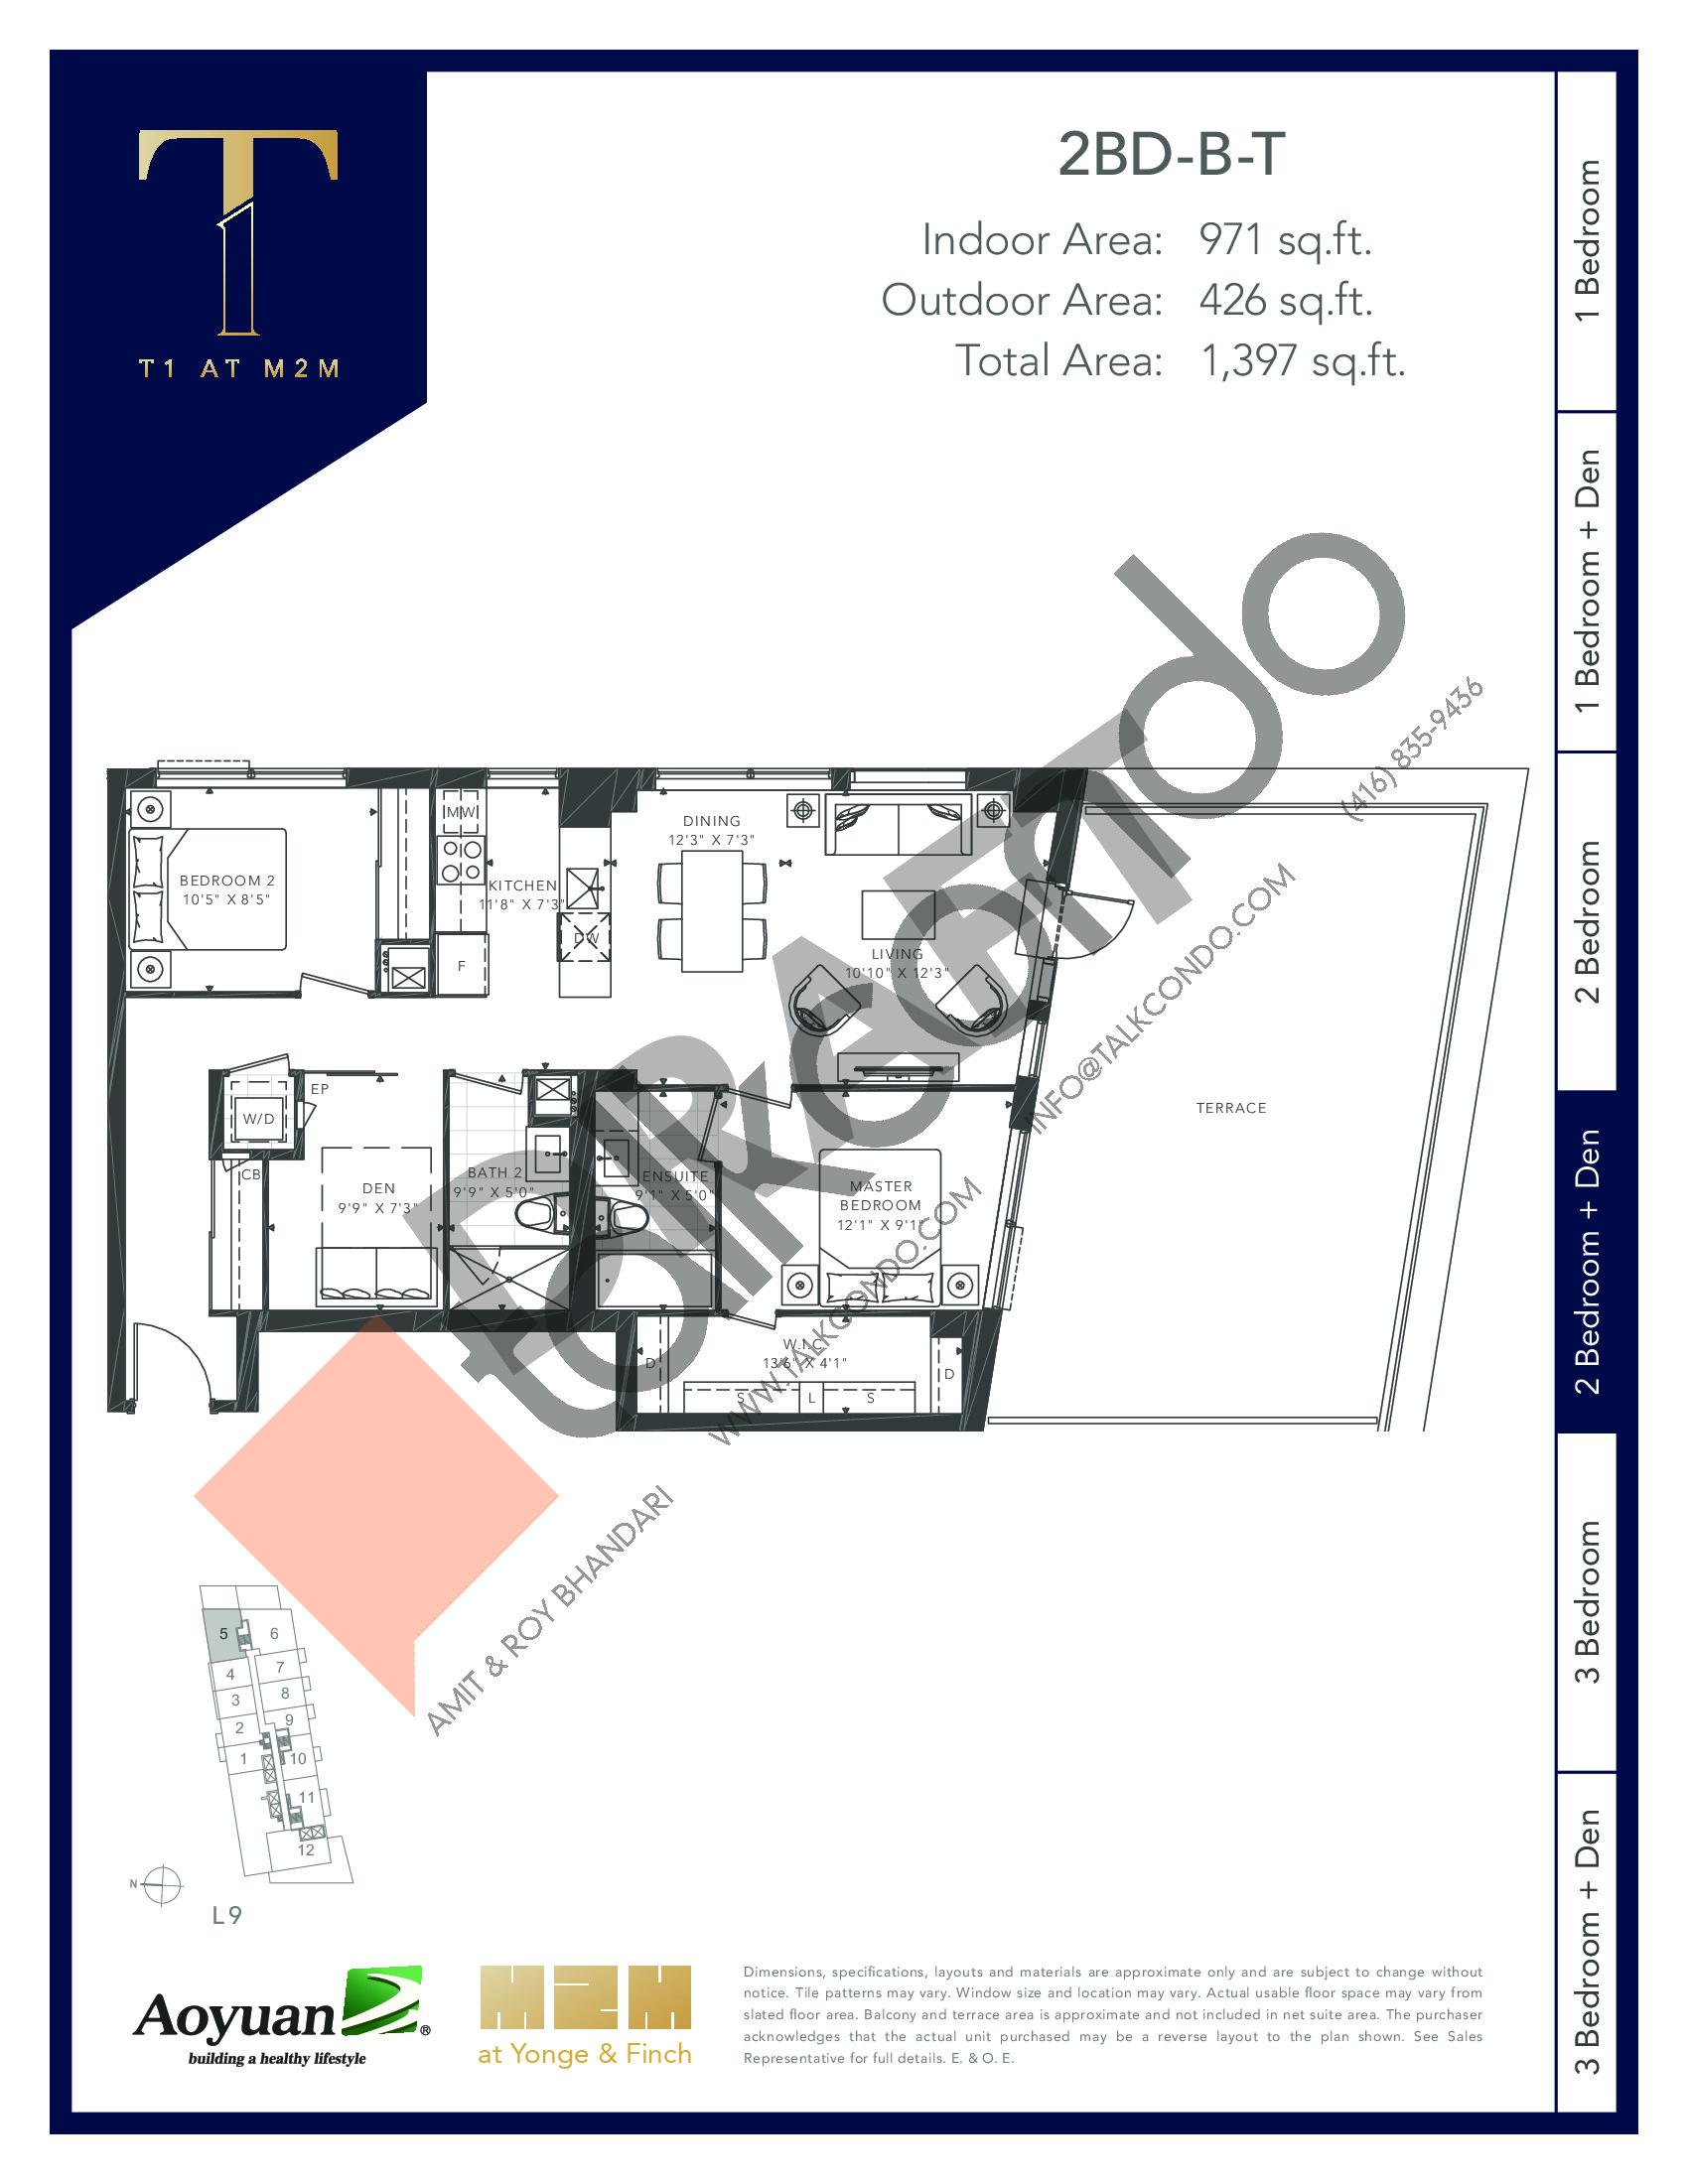 2BD-B-T (Podium) Floor Plan at T1 at M2M Condos - 971 sq.ft